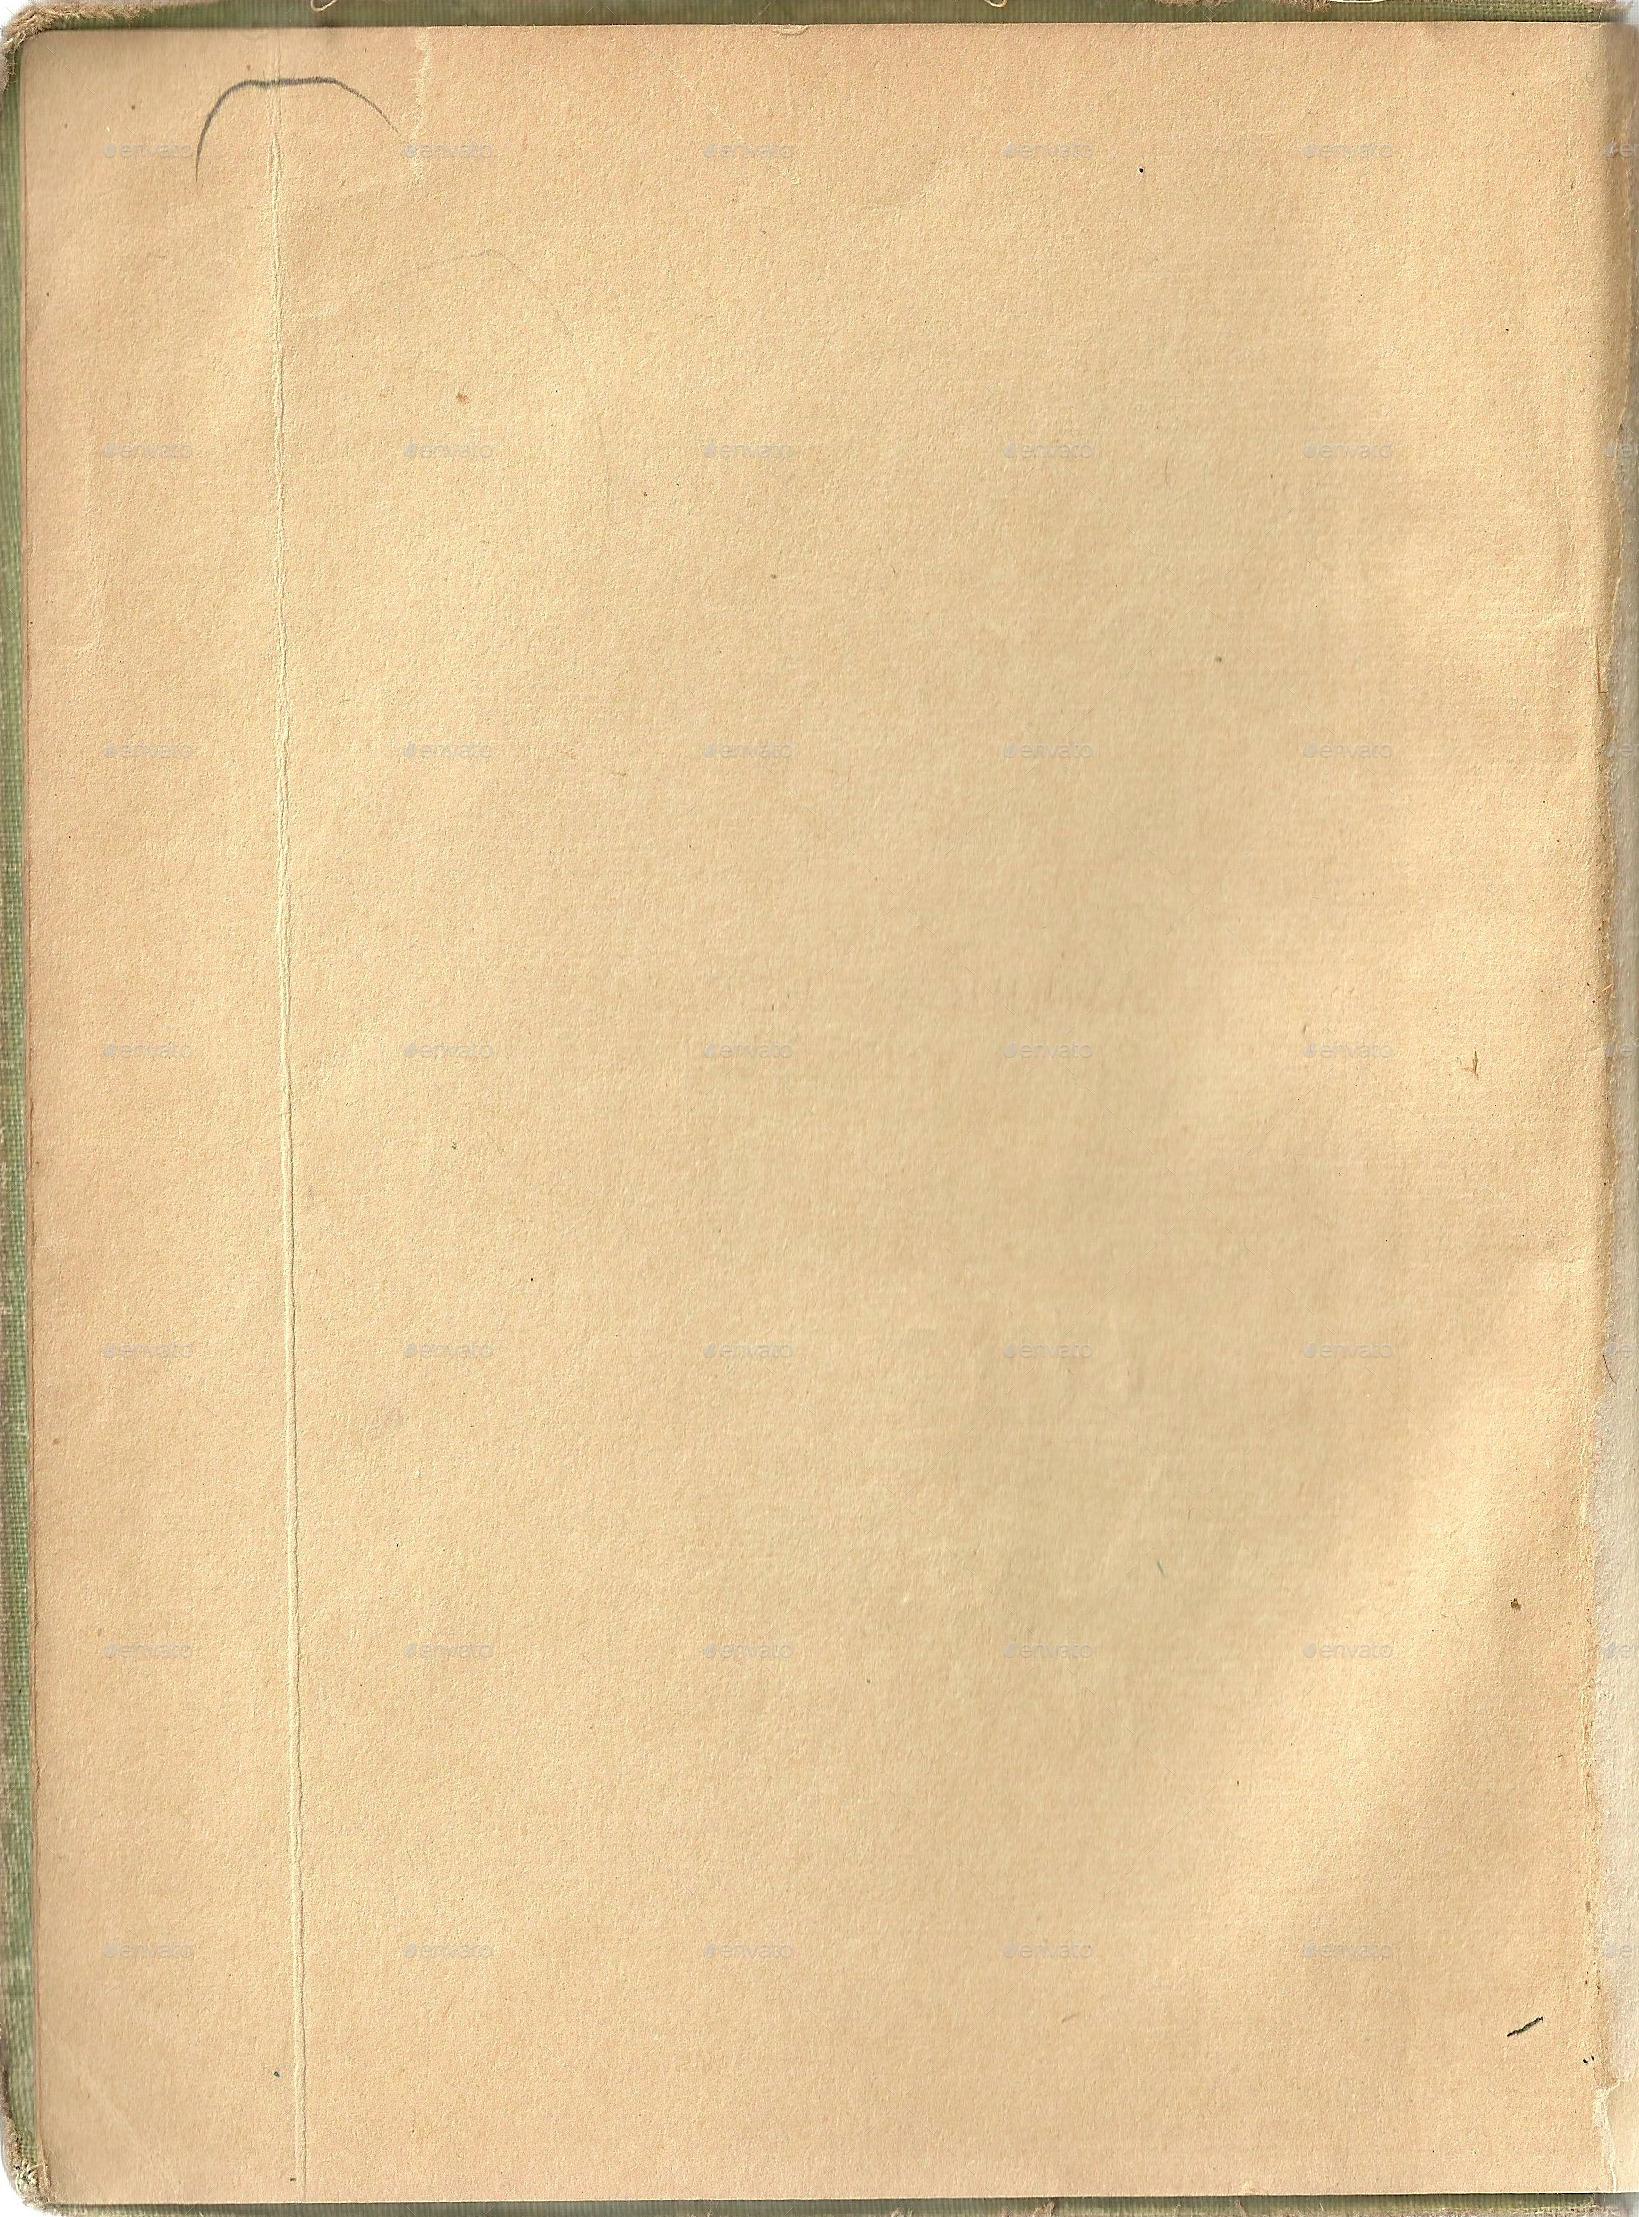 Book Textures Vintage Texture 6